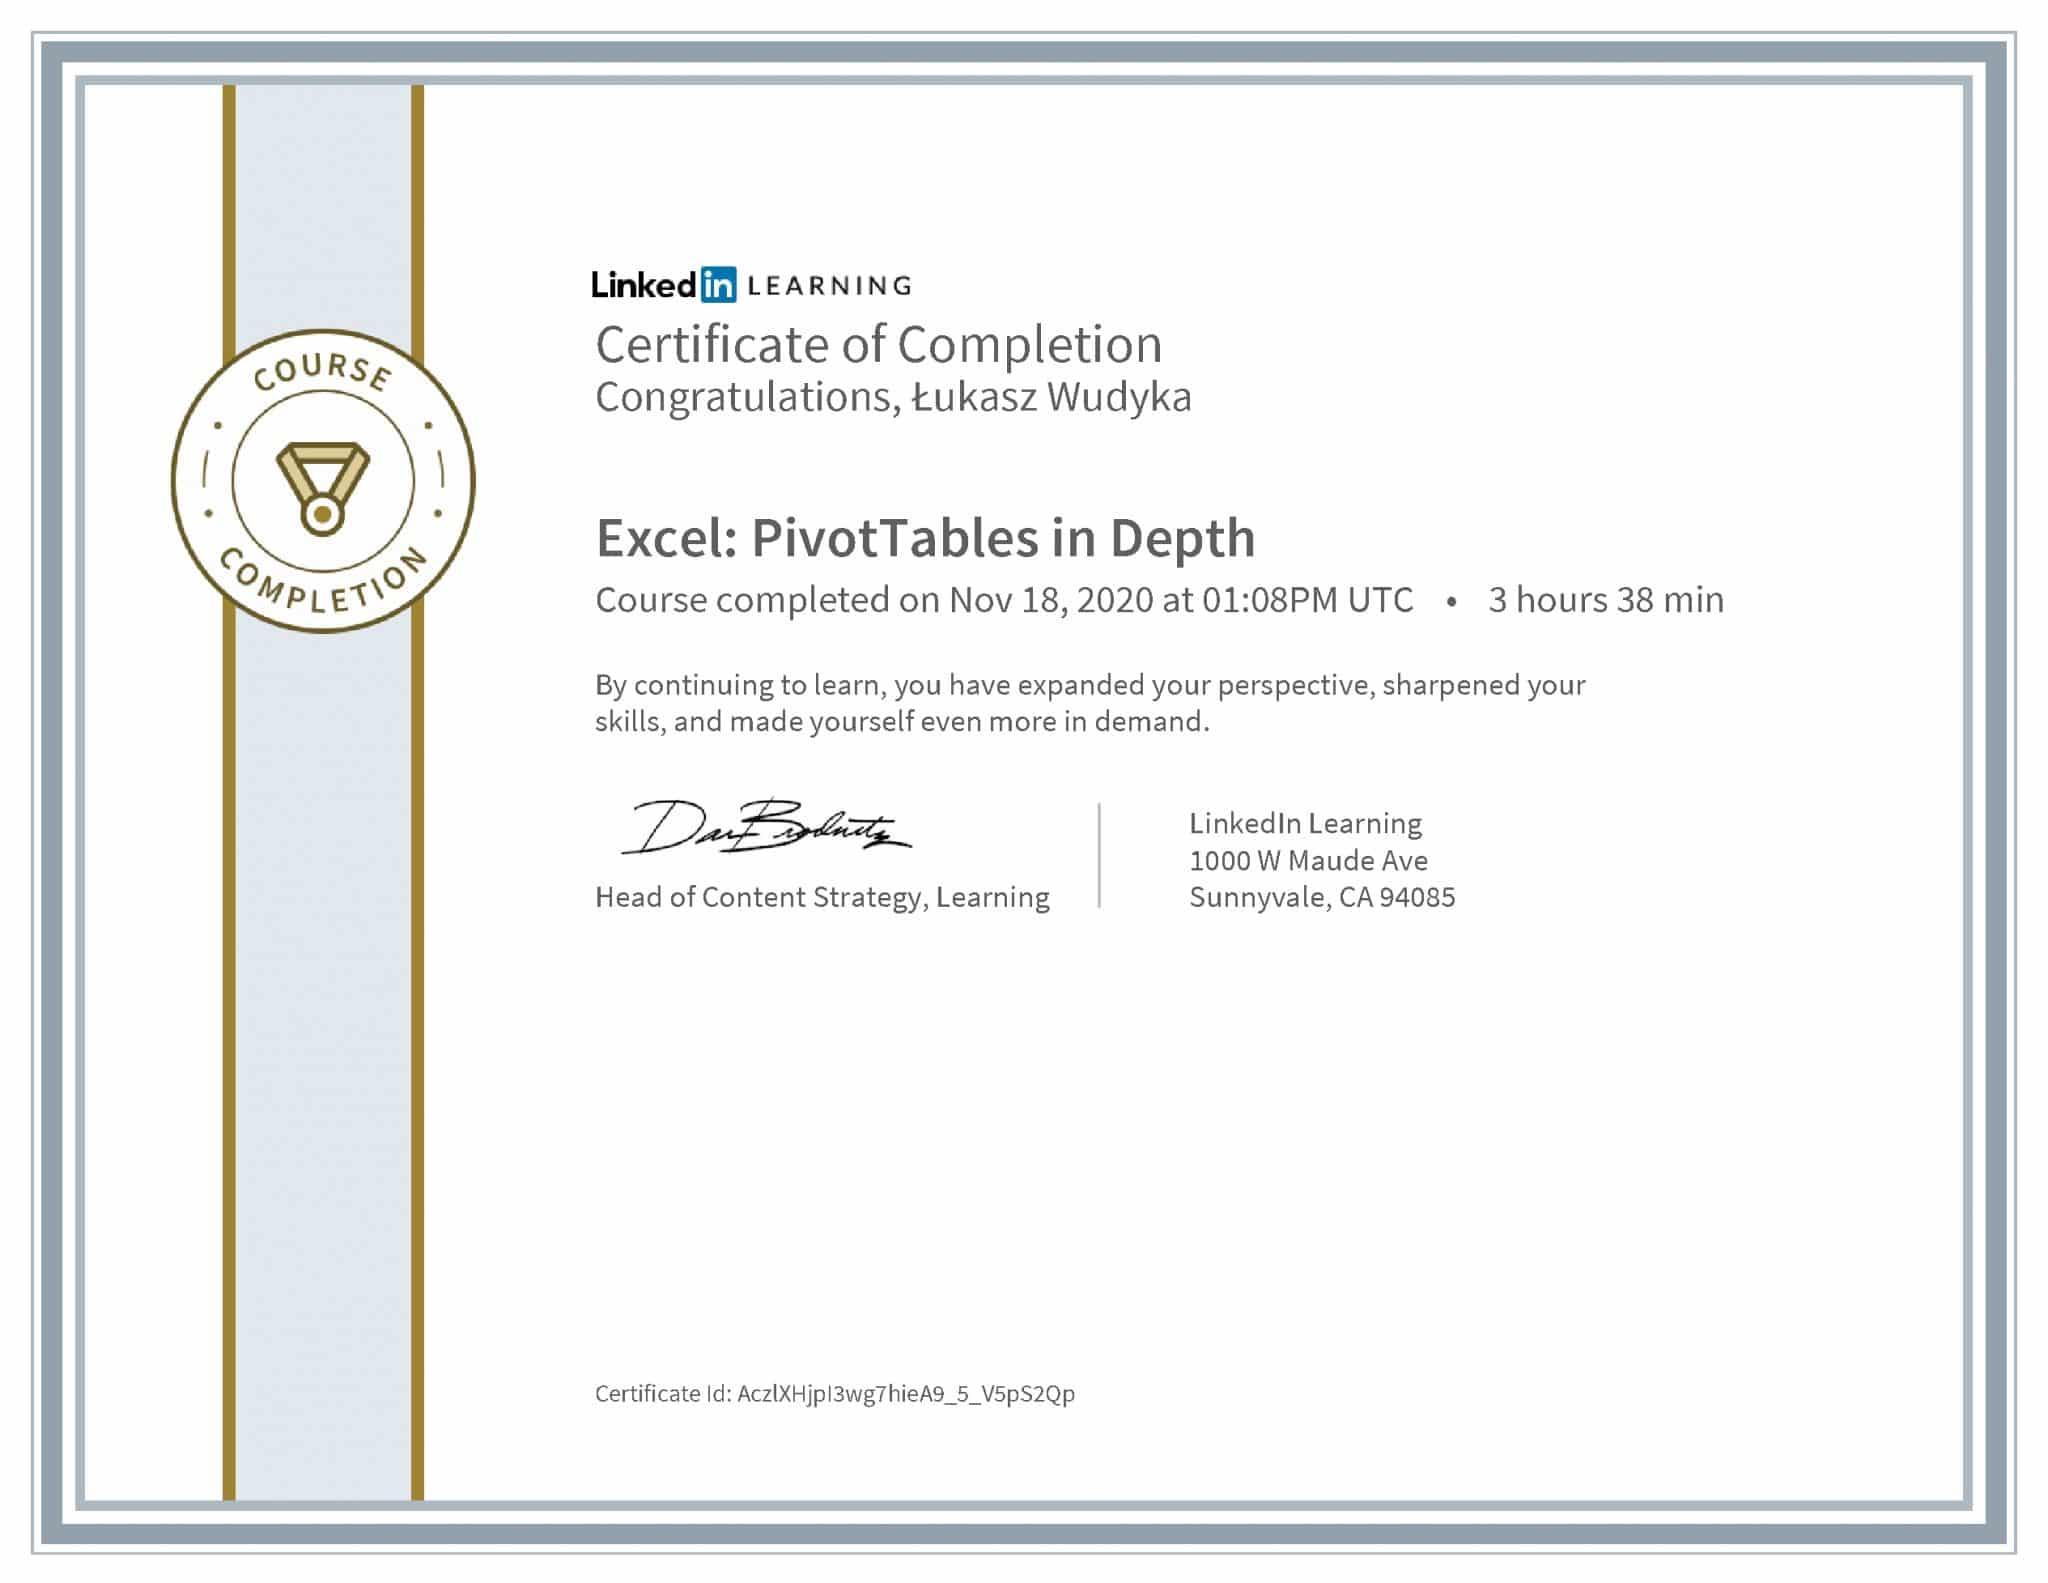 Łukasz Wudyka certyfikat LinkedIn Excel: PivotTables in Depth